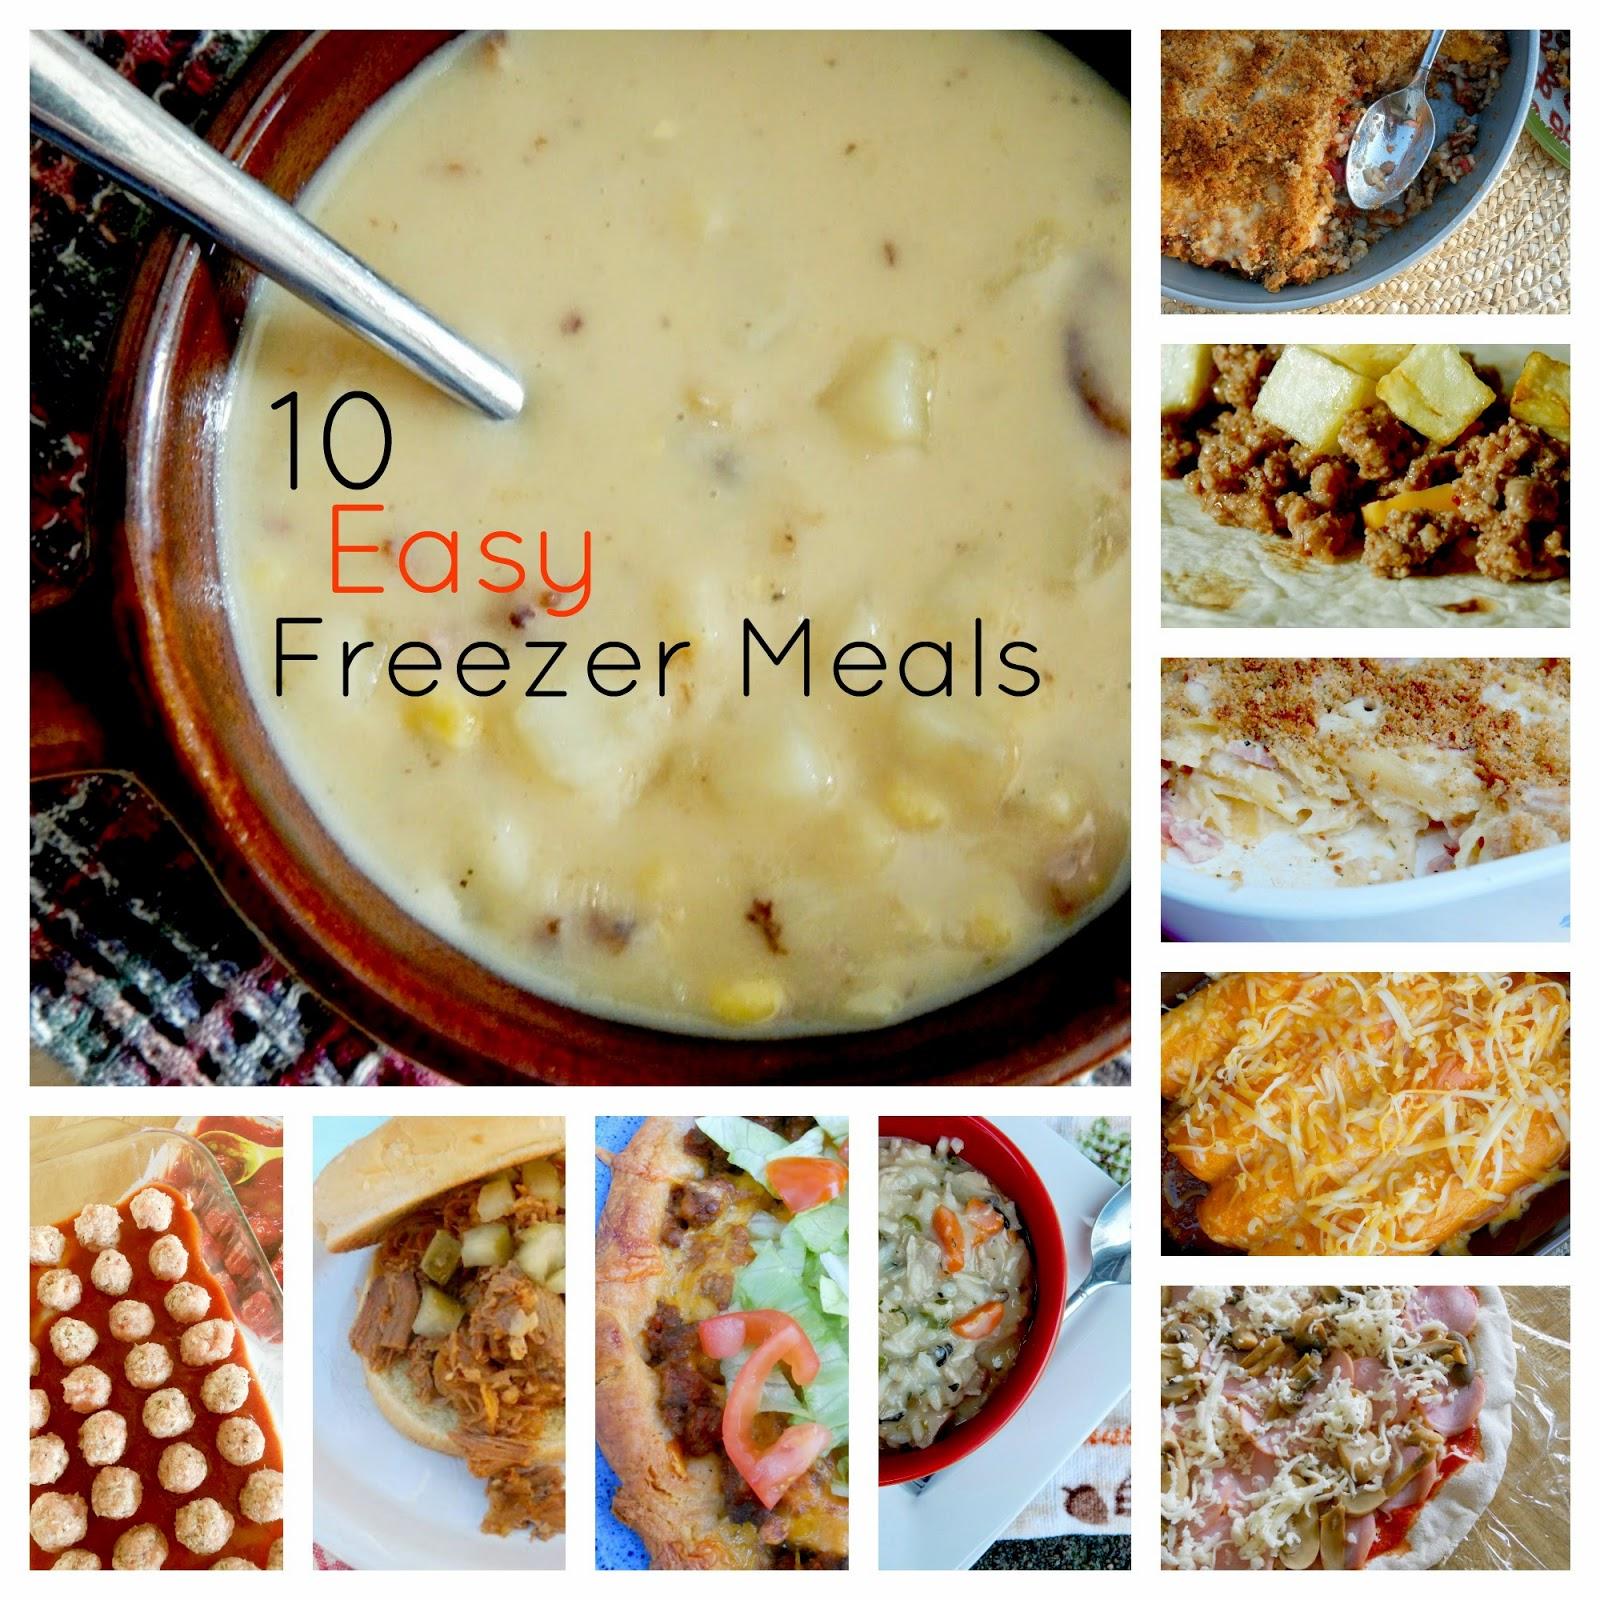 10 easy freezer meals (sweetandsavoryfood.com)